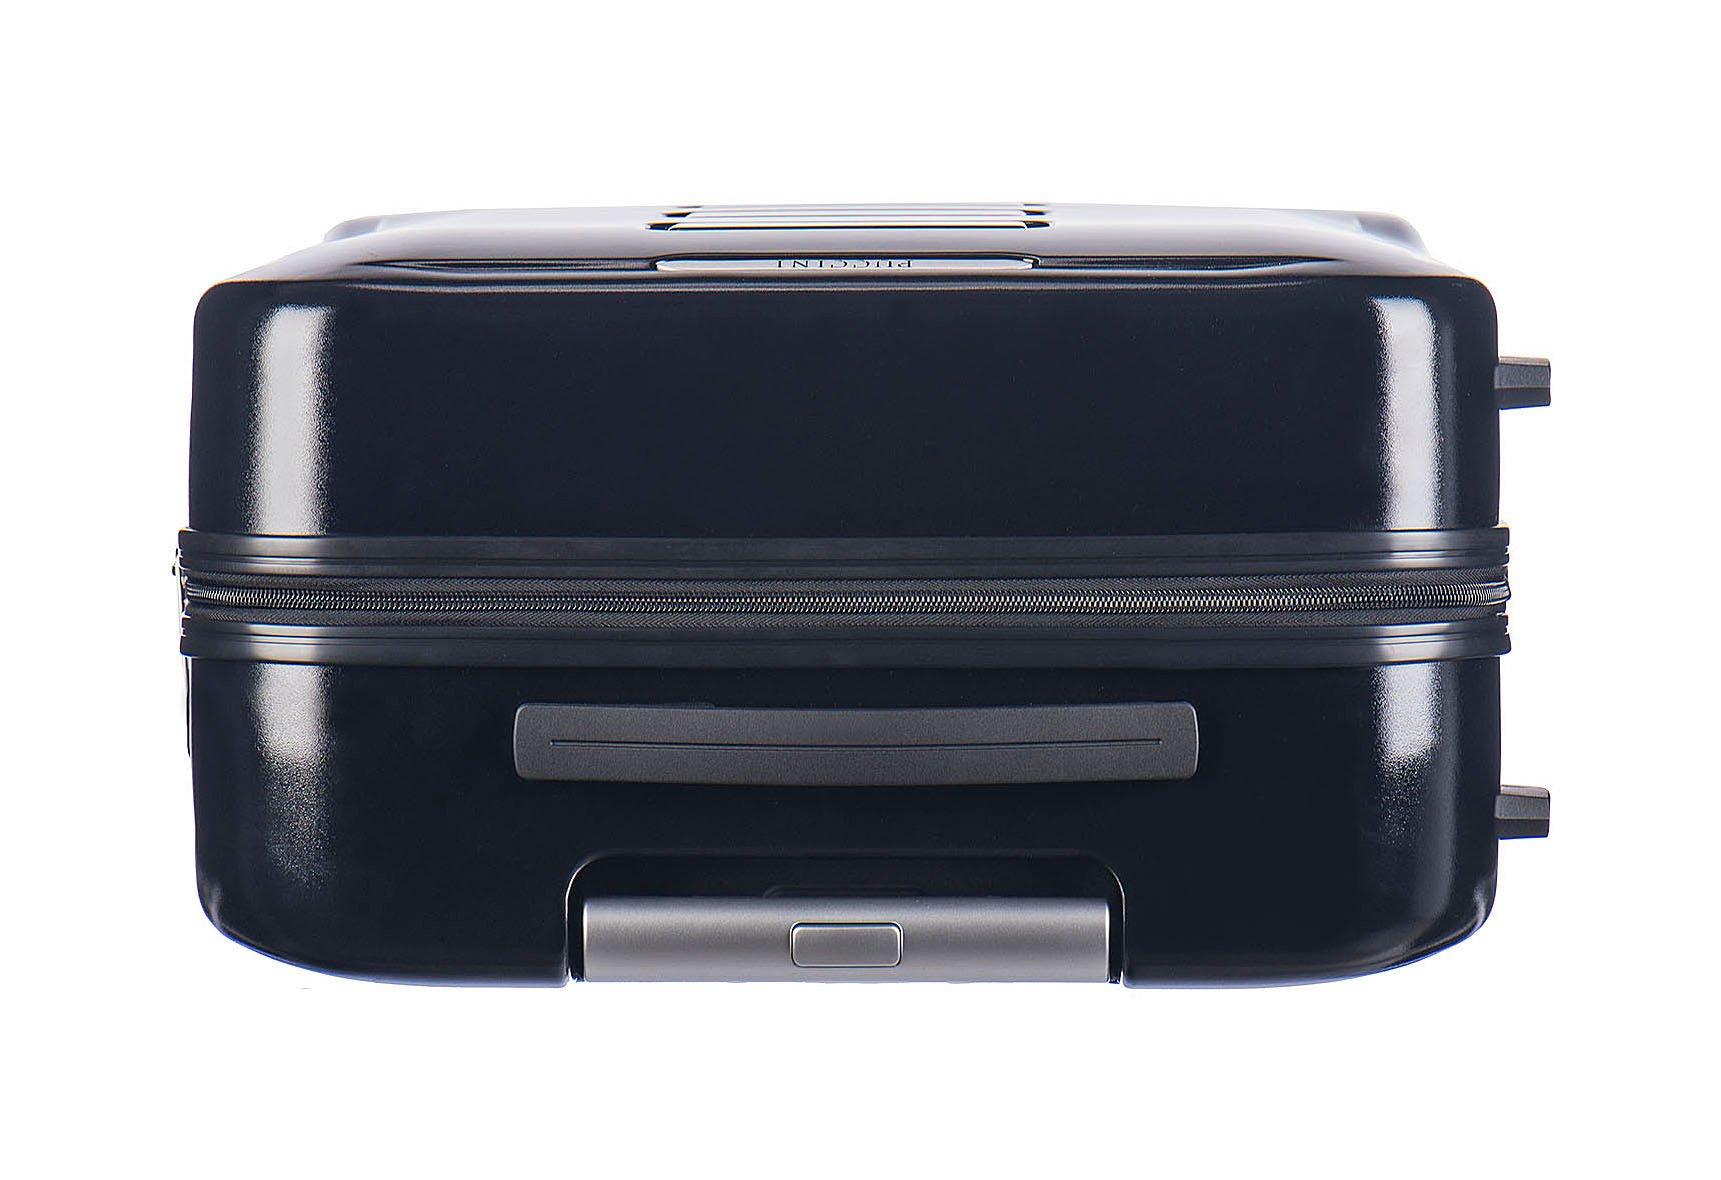 1c0da7b4b1d00 Twarda walizka podróżna Puccini duża czarna 120 l - 7294788831 ...